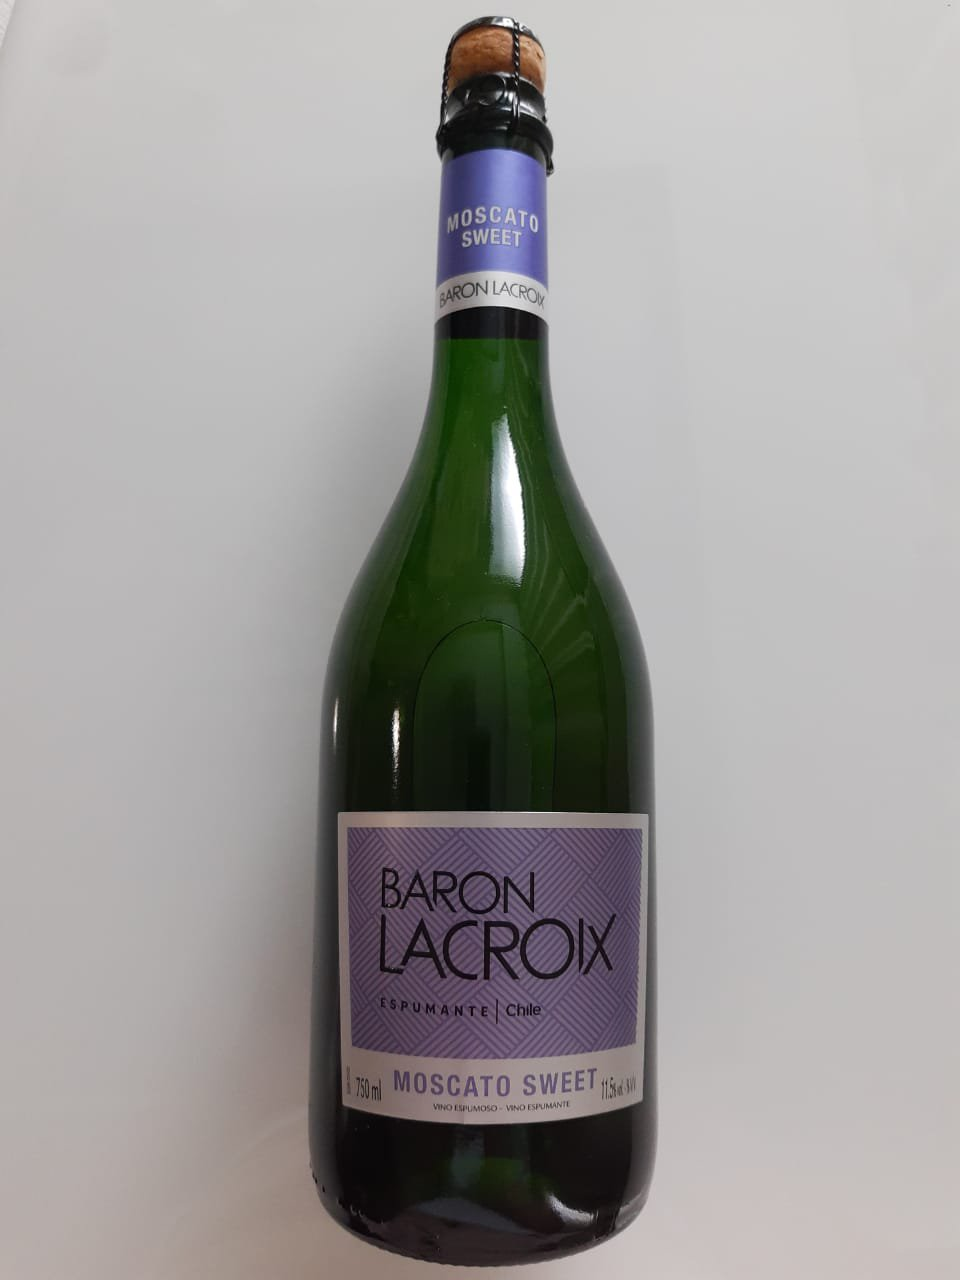 Vinho Baron Lacroix Moscato Sweet 750ml